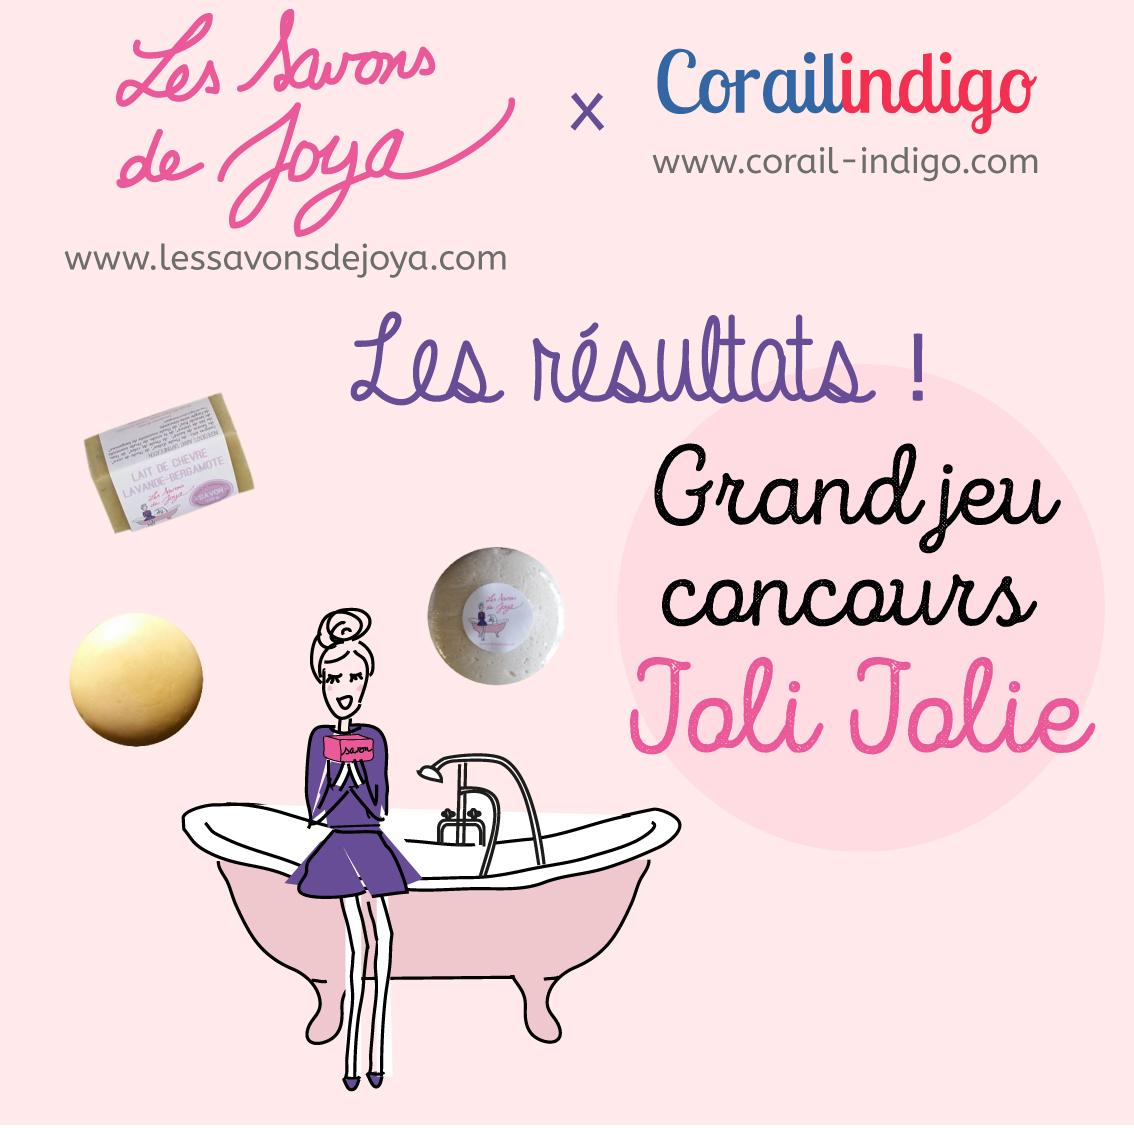 jeu-concours-corailindigo-joya-image--resultats